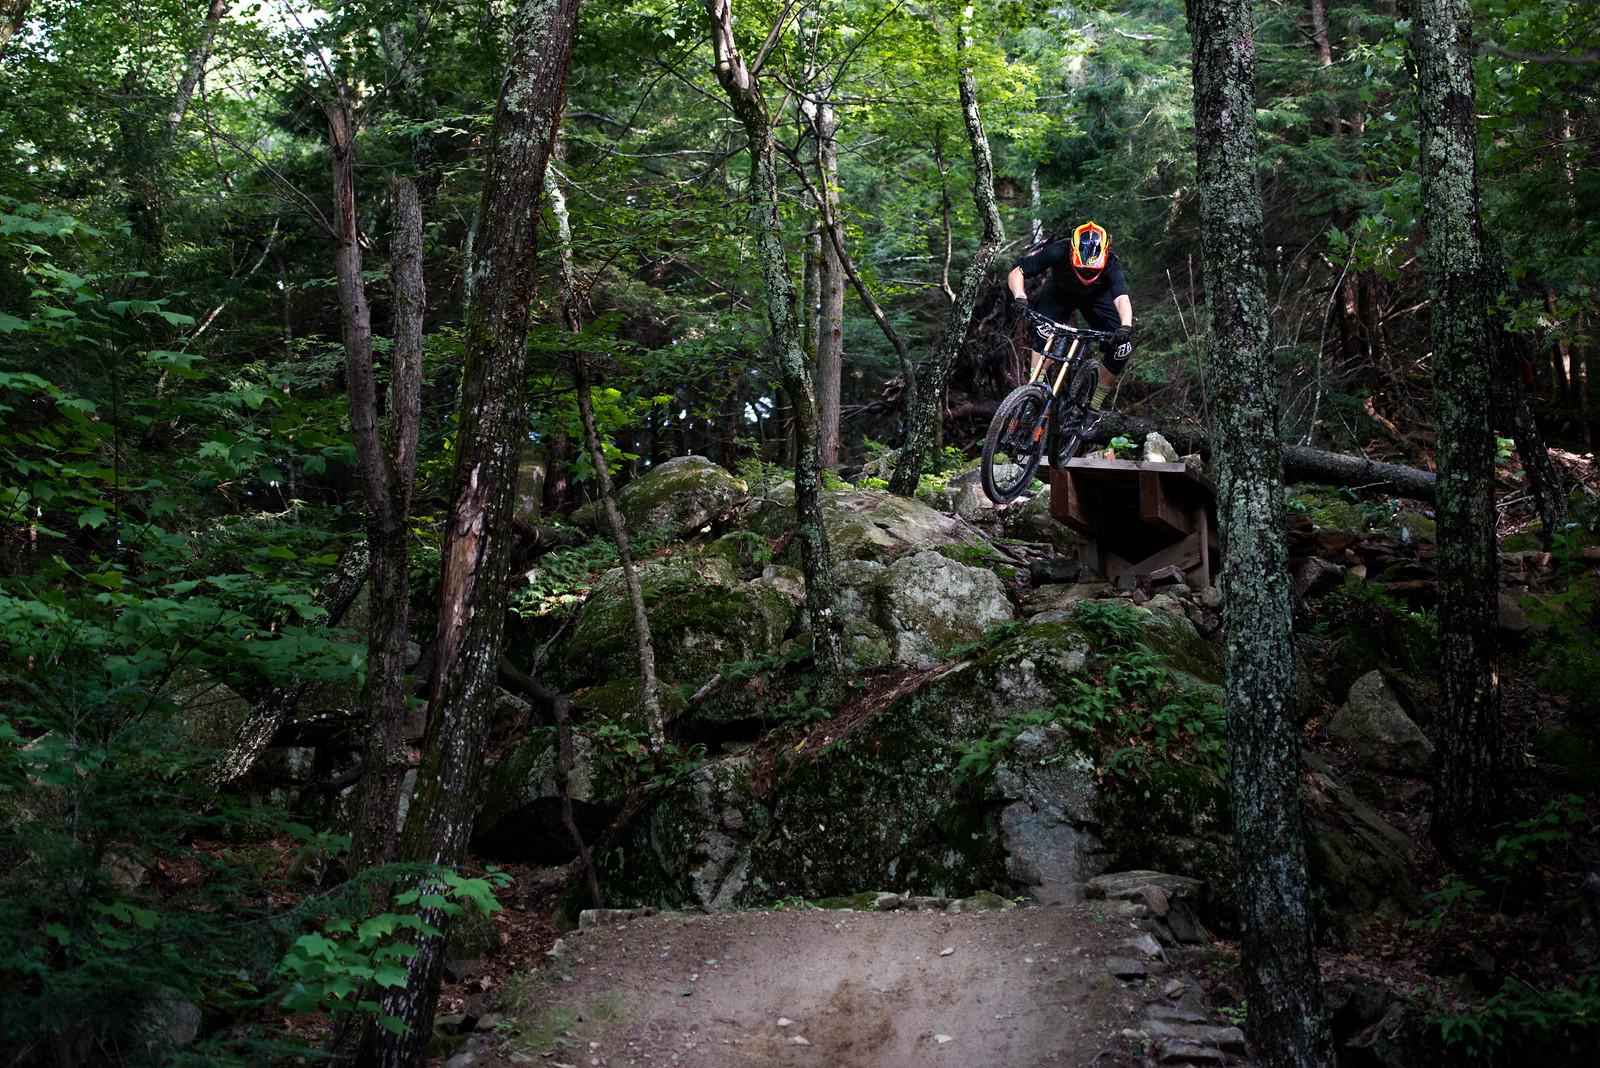 Droppin' in - myriamlarochee - Mountain Biking Pictures - Vital MTB